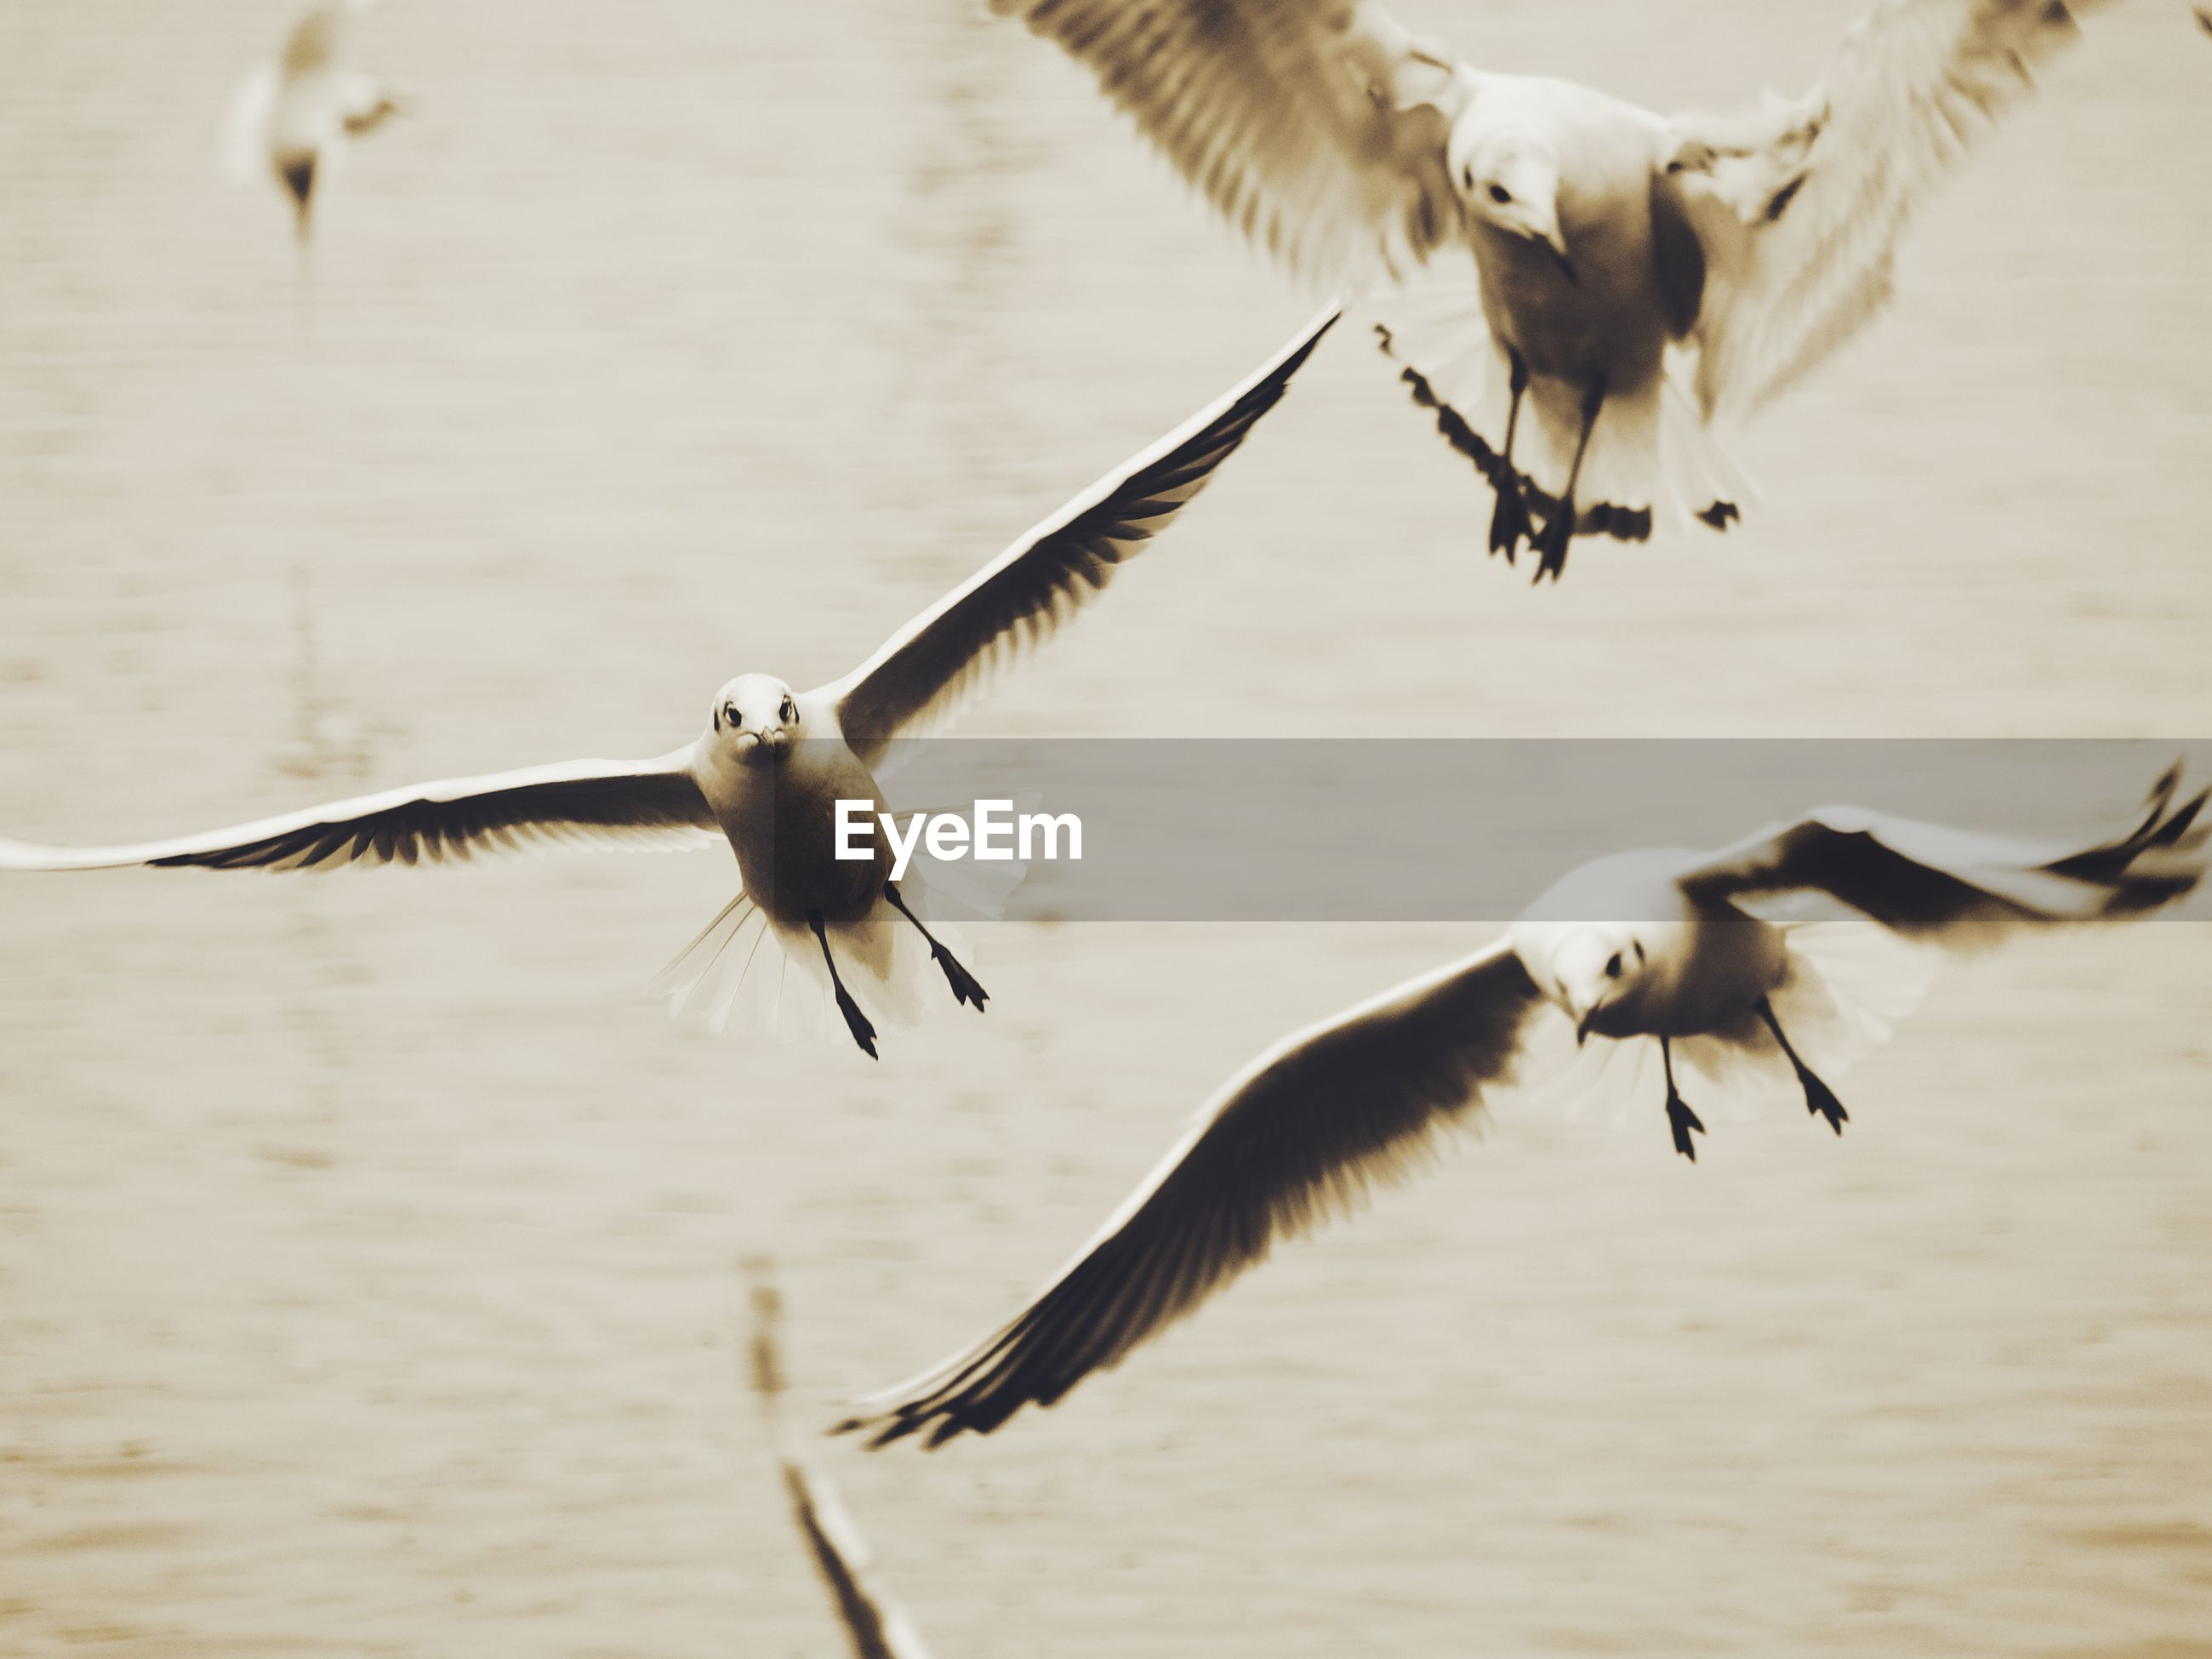 SEAGULLS FLYING IN A BIRD